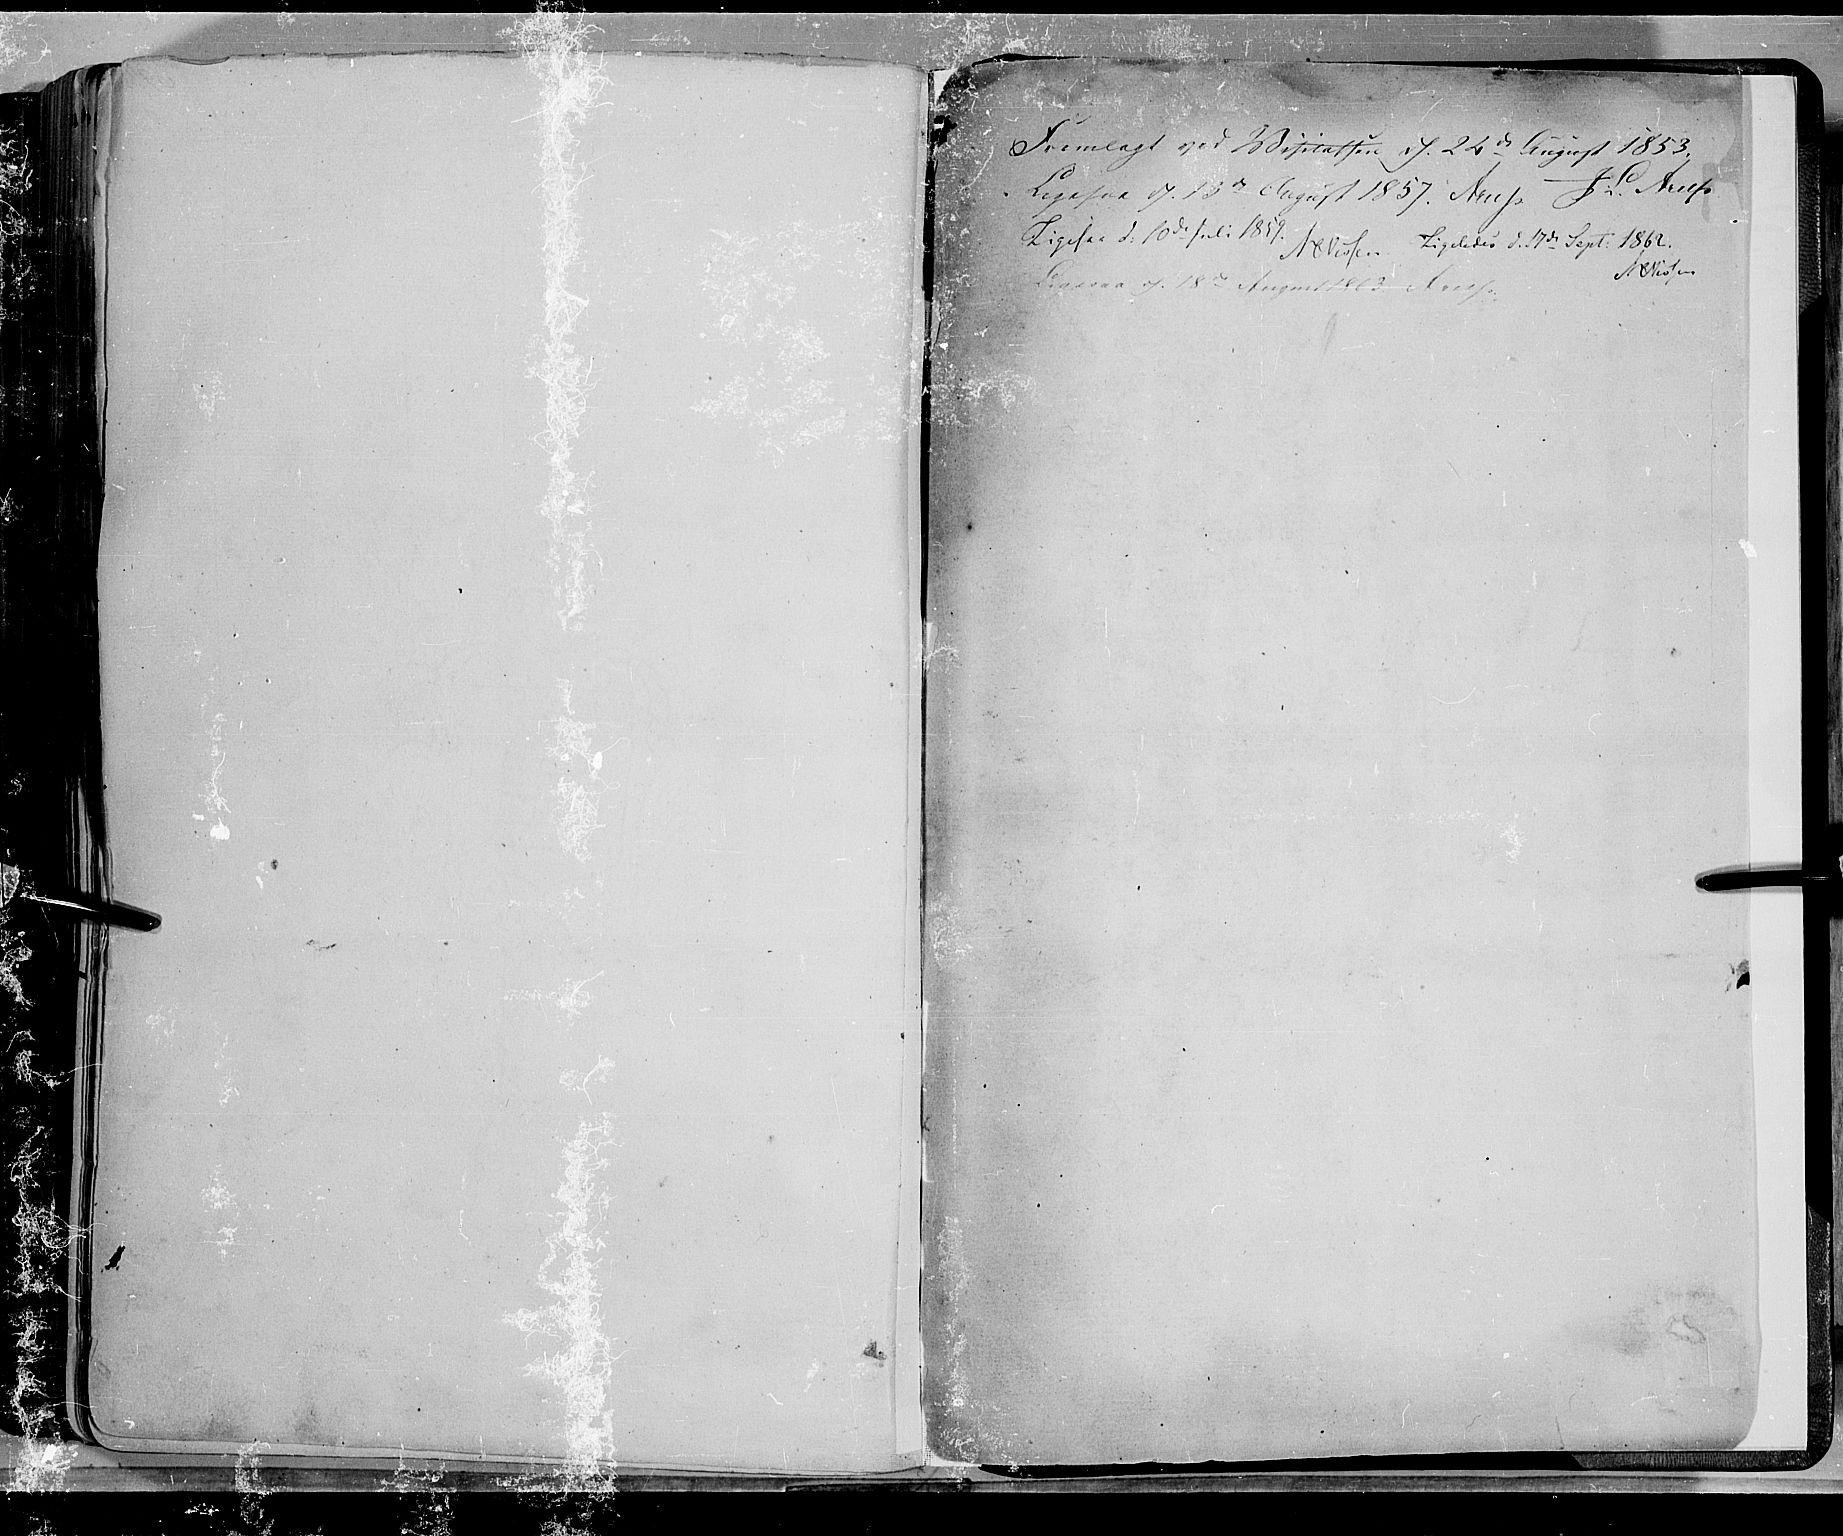 SAH, Lom prestekontor, K/L0006: Ministerialbok nr. 6B, 1837-1863